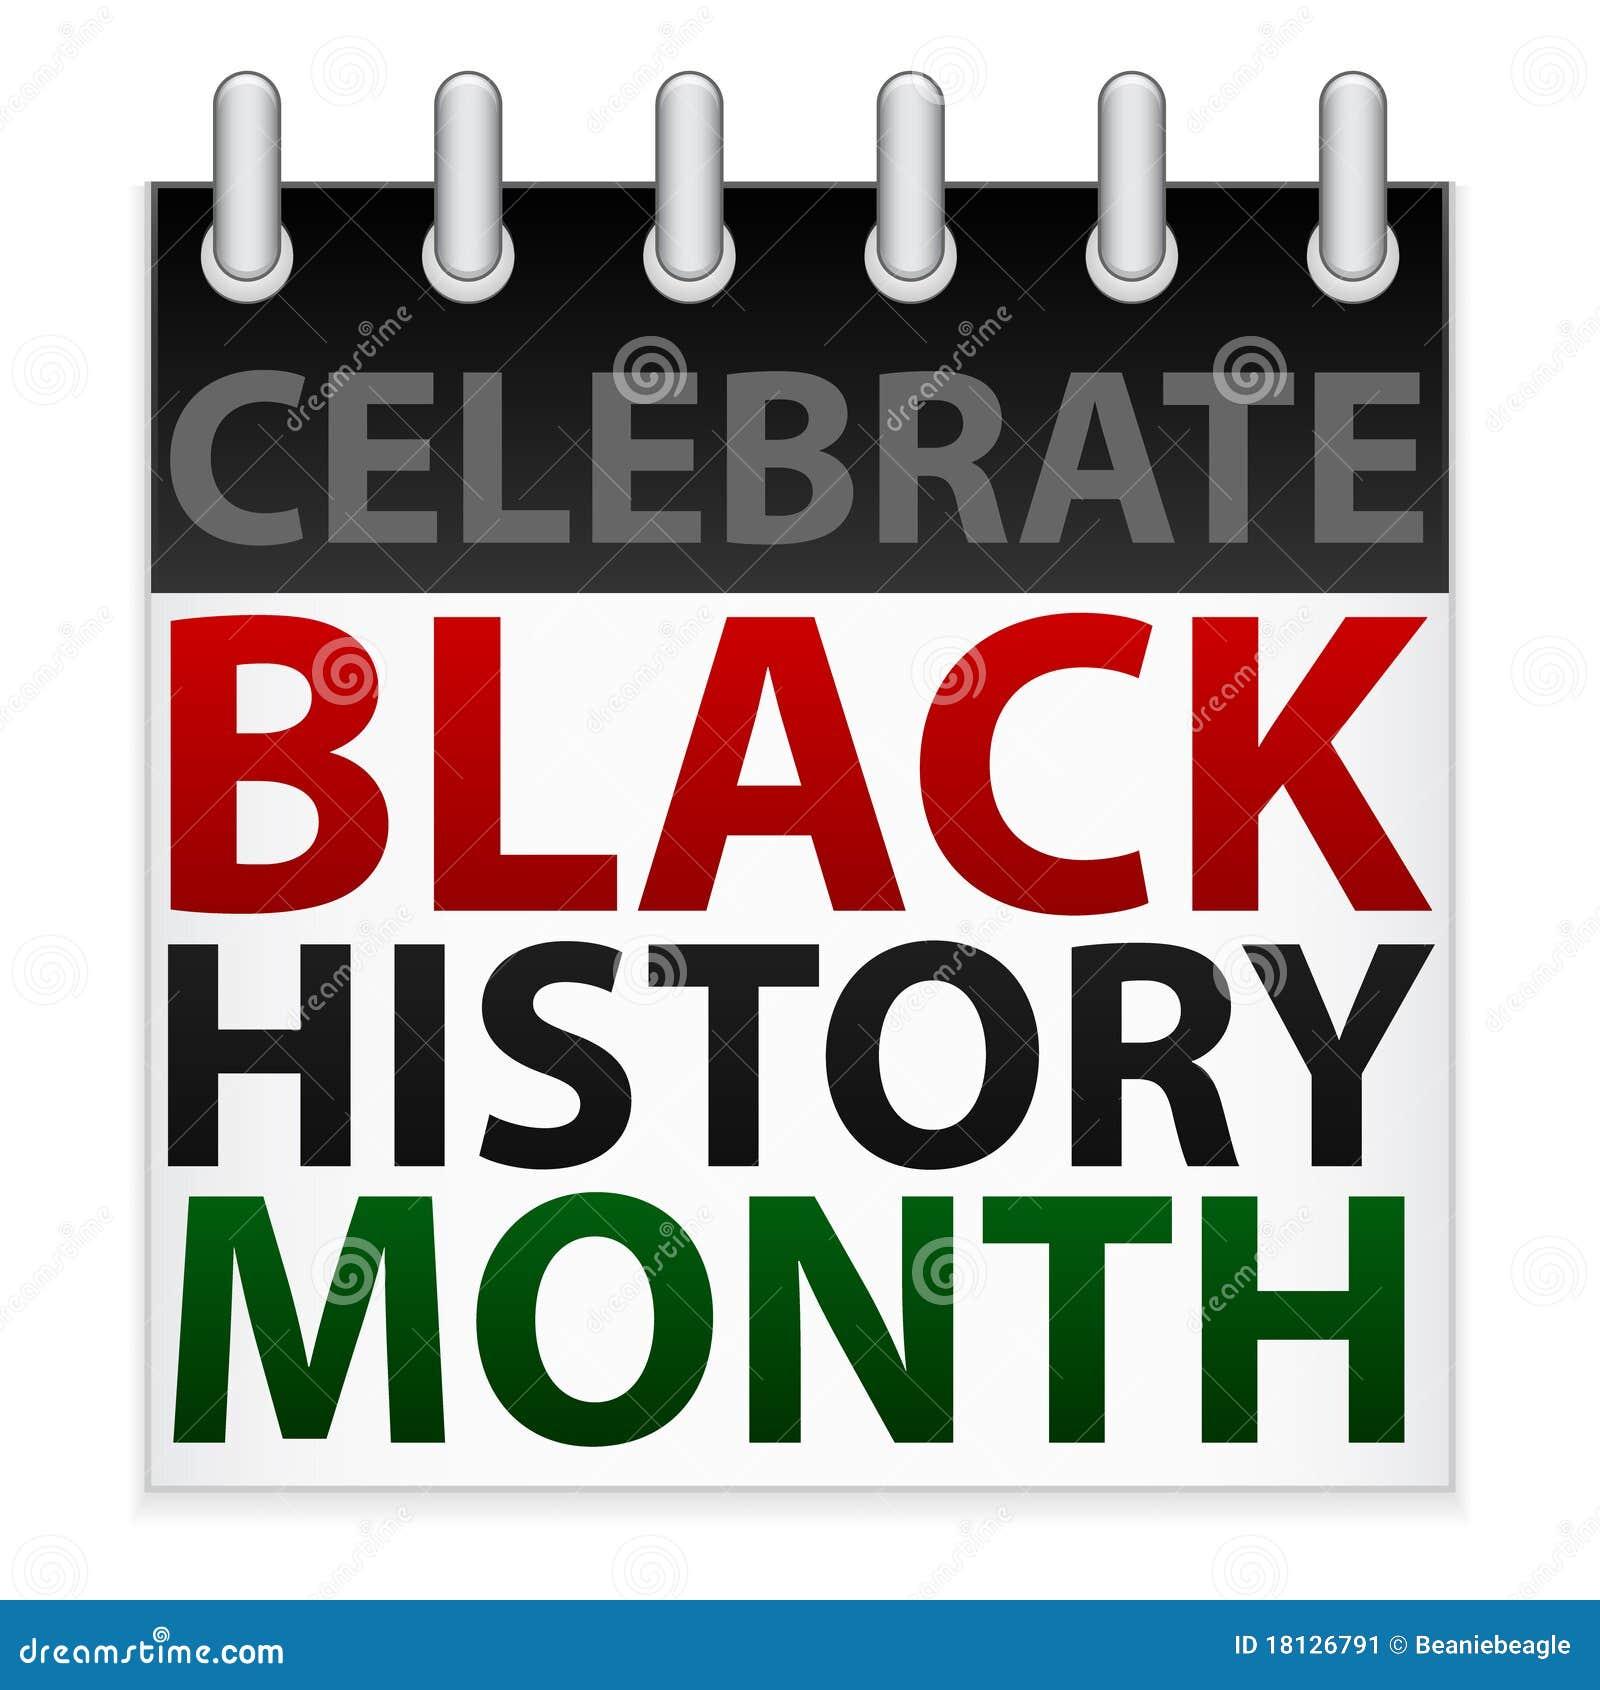 celebrate black history month icon stock vector illustration of rh dreamstime com black history month clipart black history program clipart